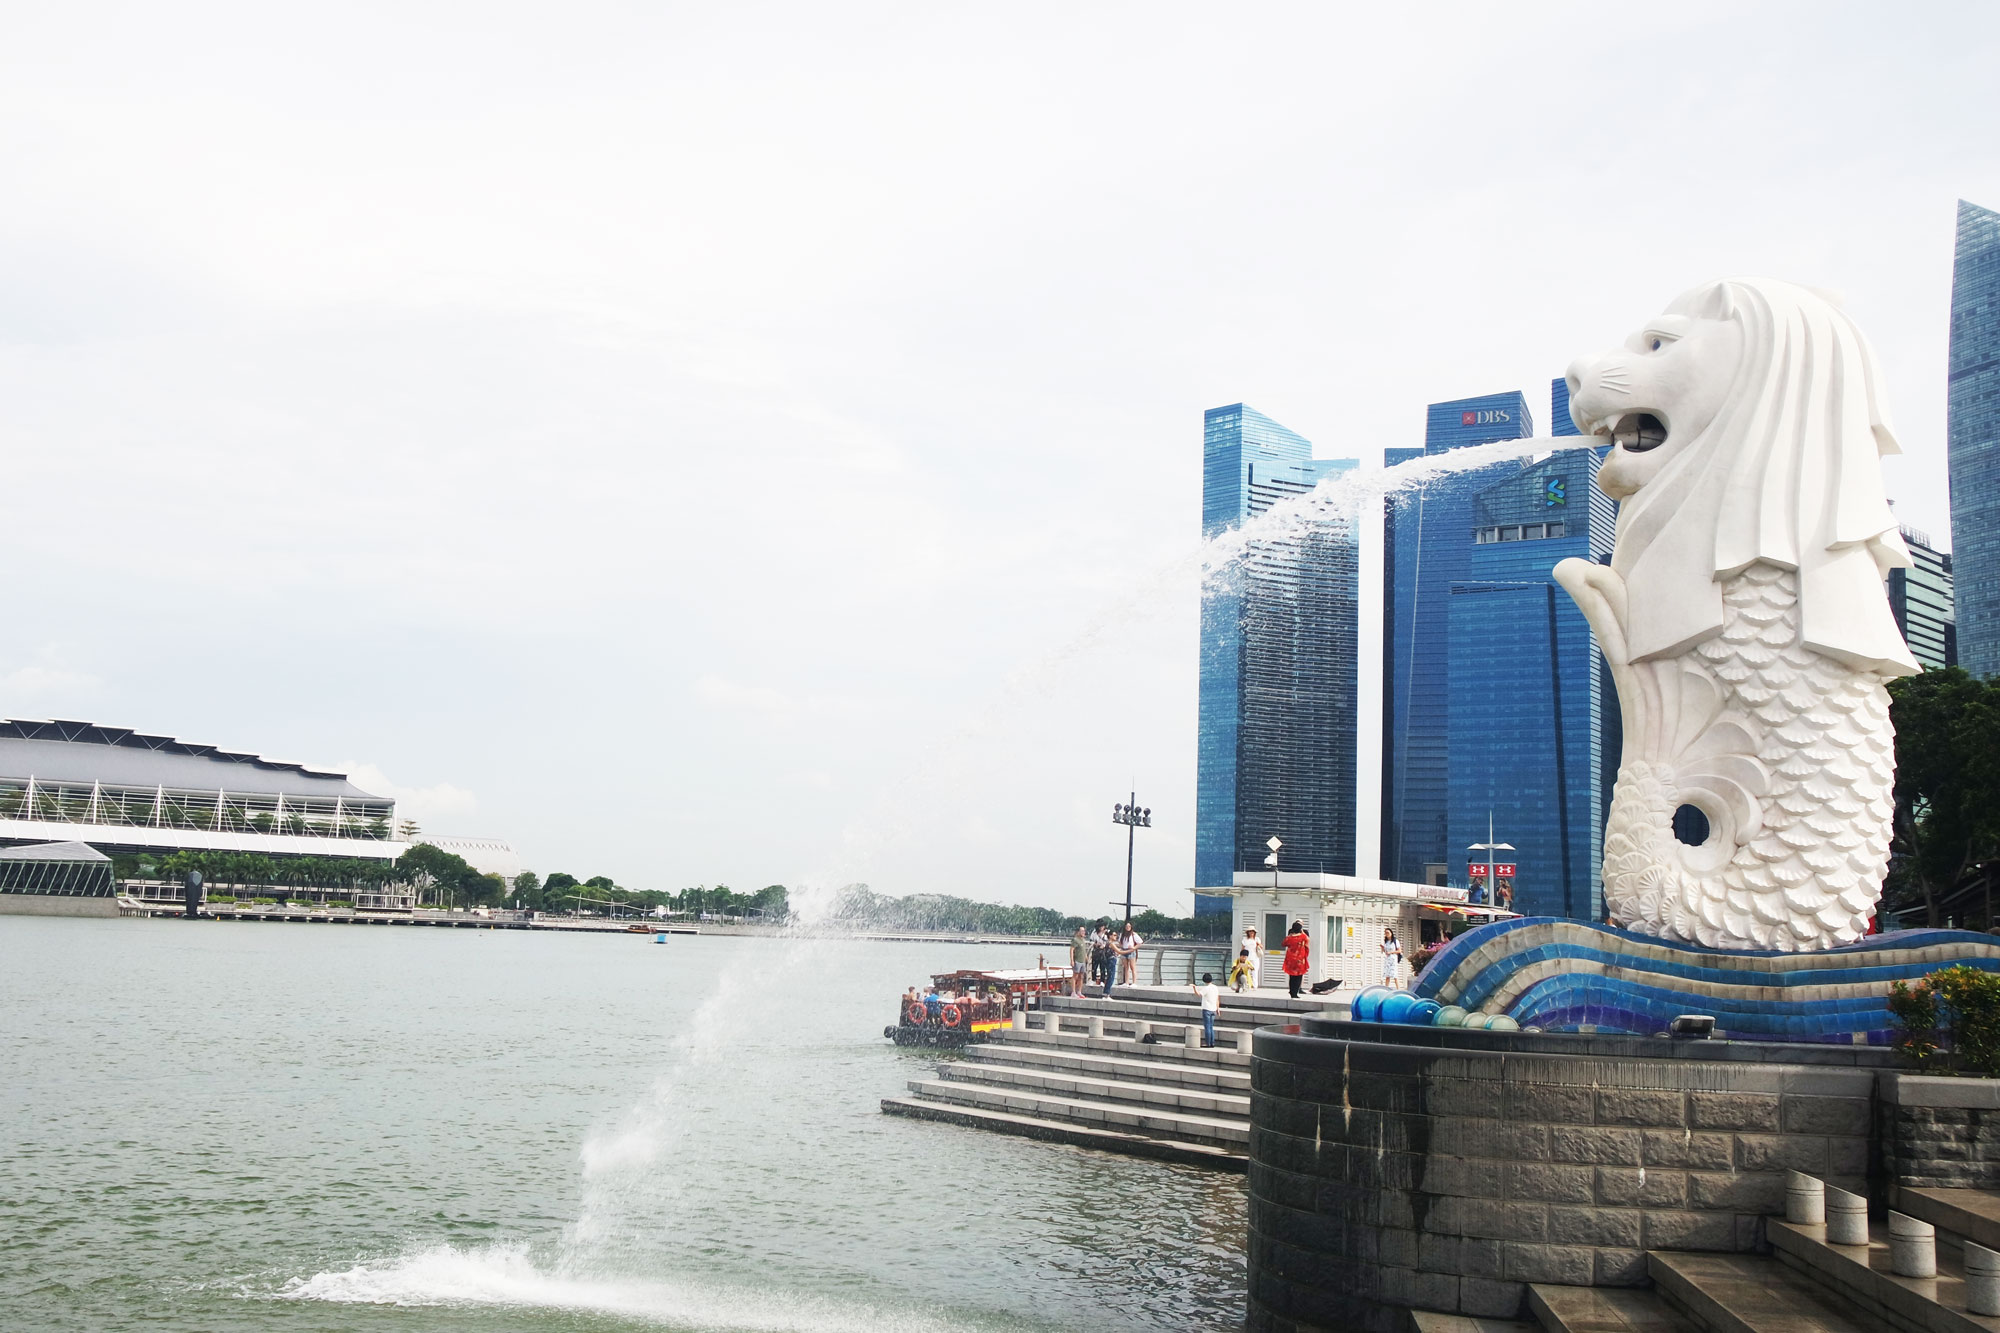 Merlion van Singapore